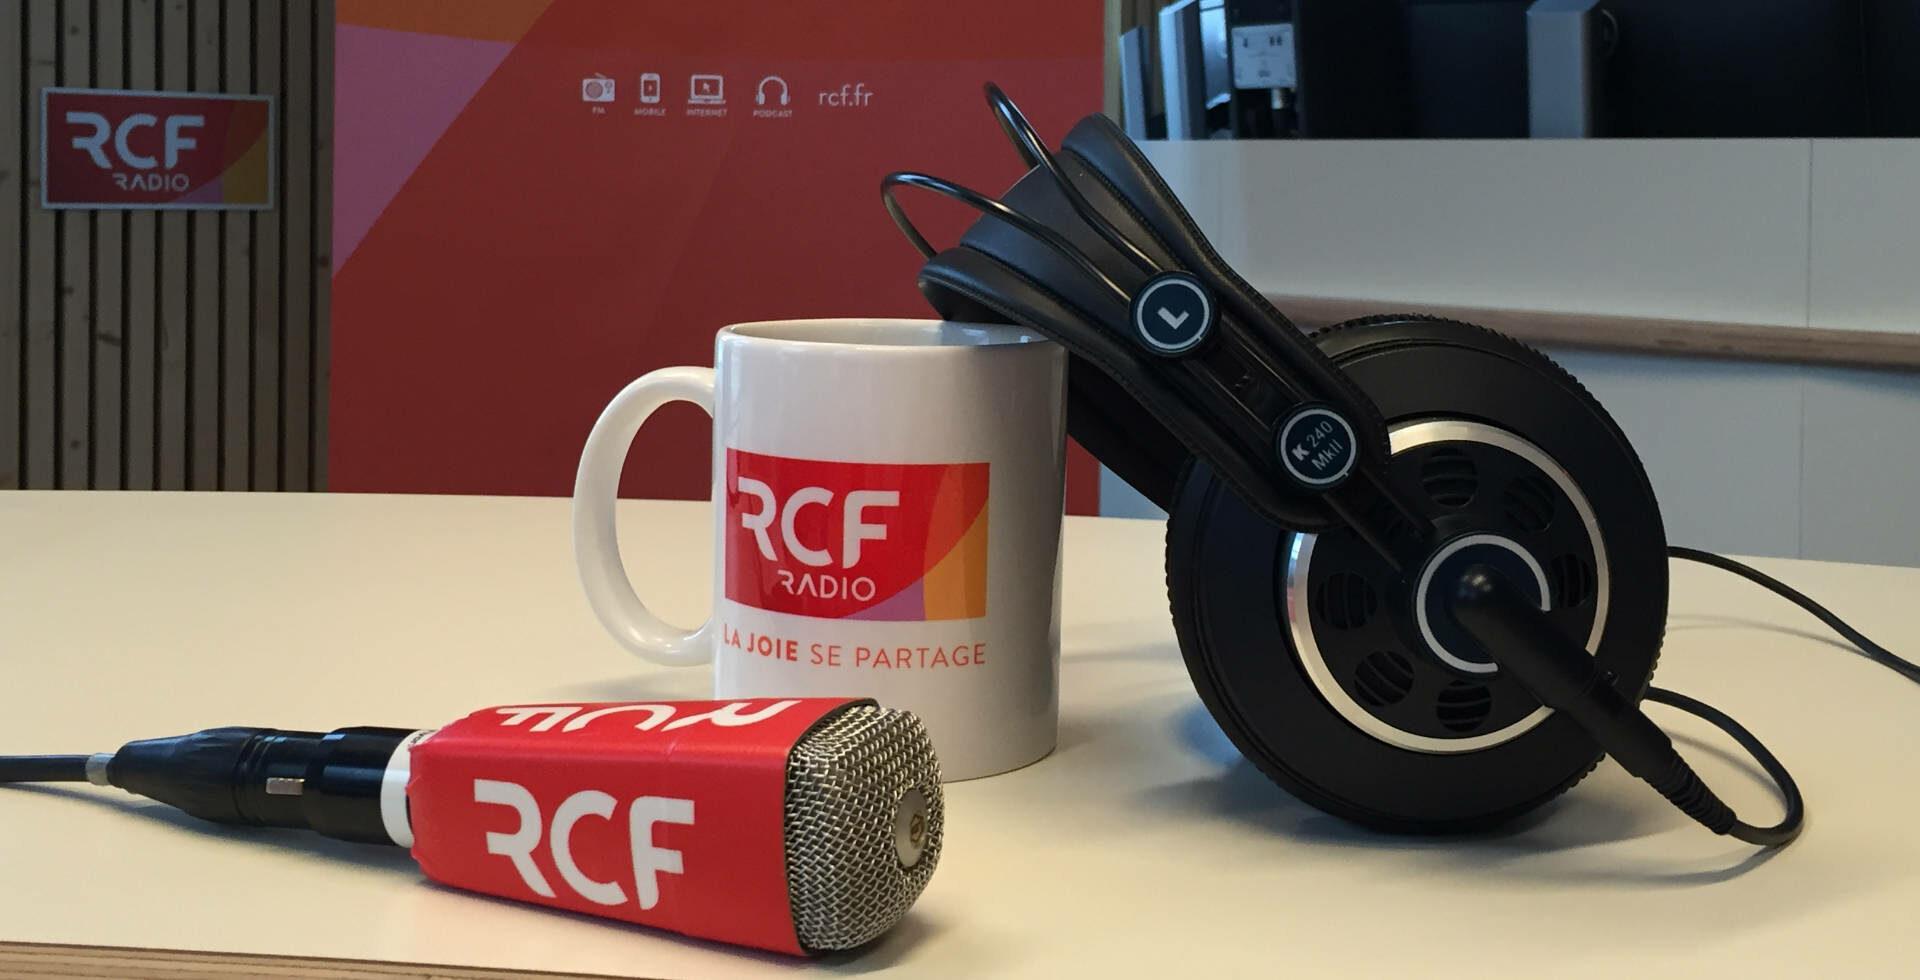 header page d'accueil unisphère webradio rcf